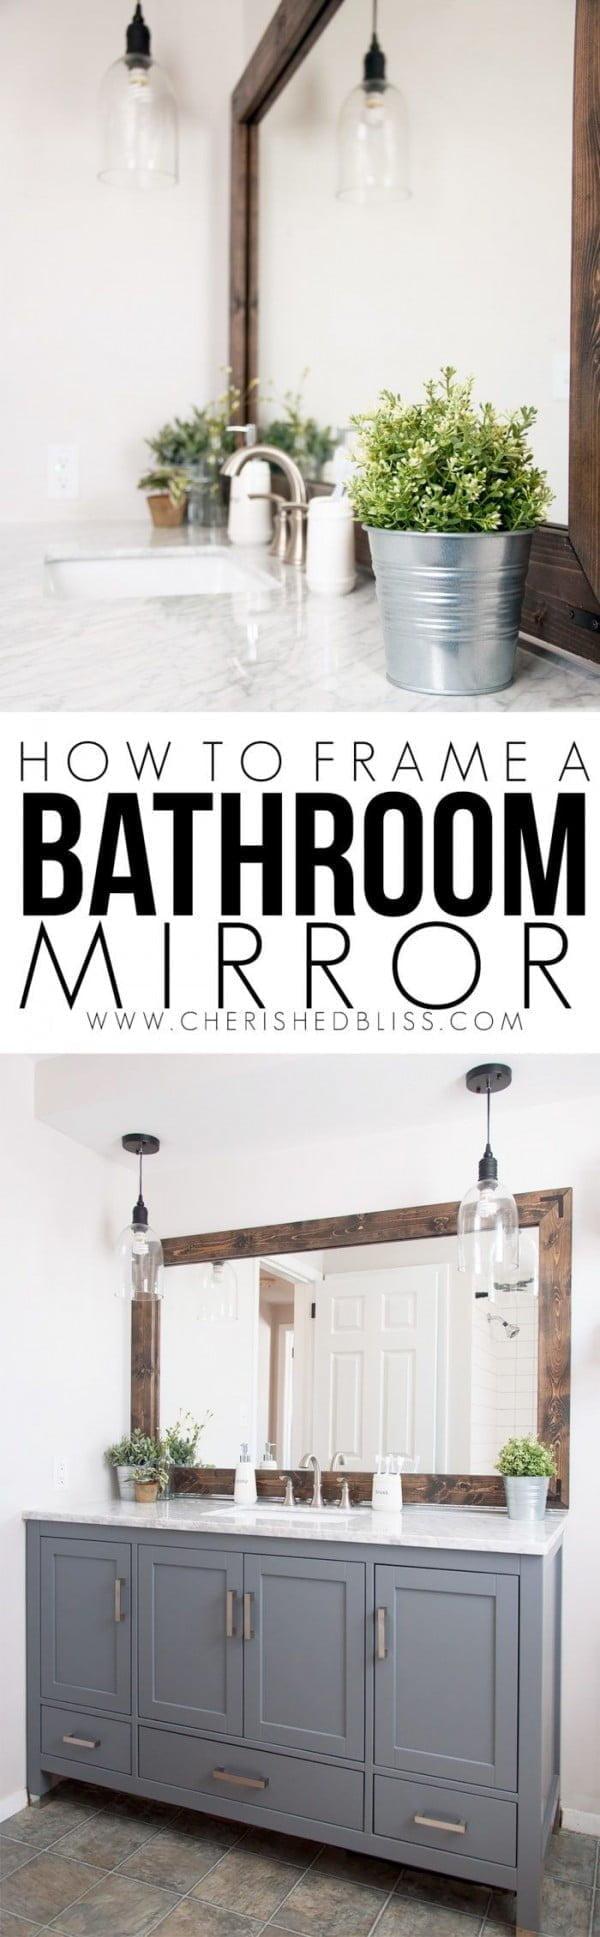 Check out the tutorial on how to make a #DIY #farmhouse bathroom mirror. Looks easy enough! #HomeDecorIdeas